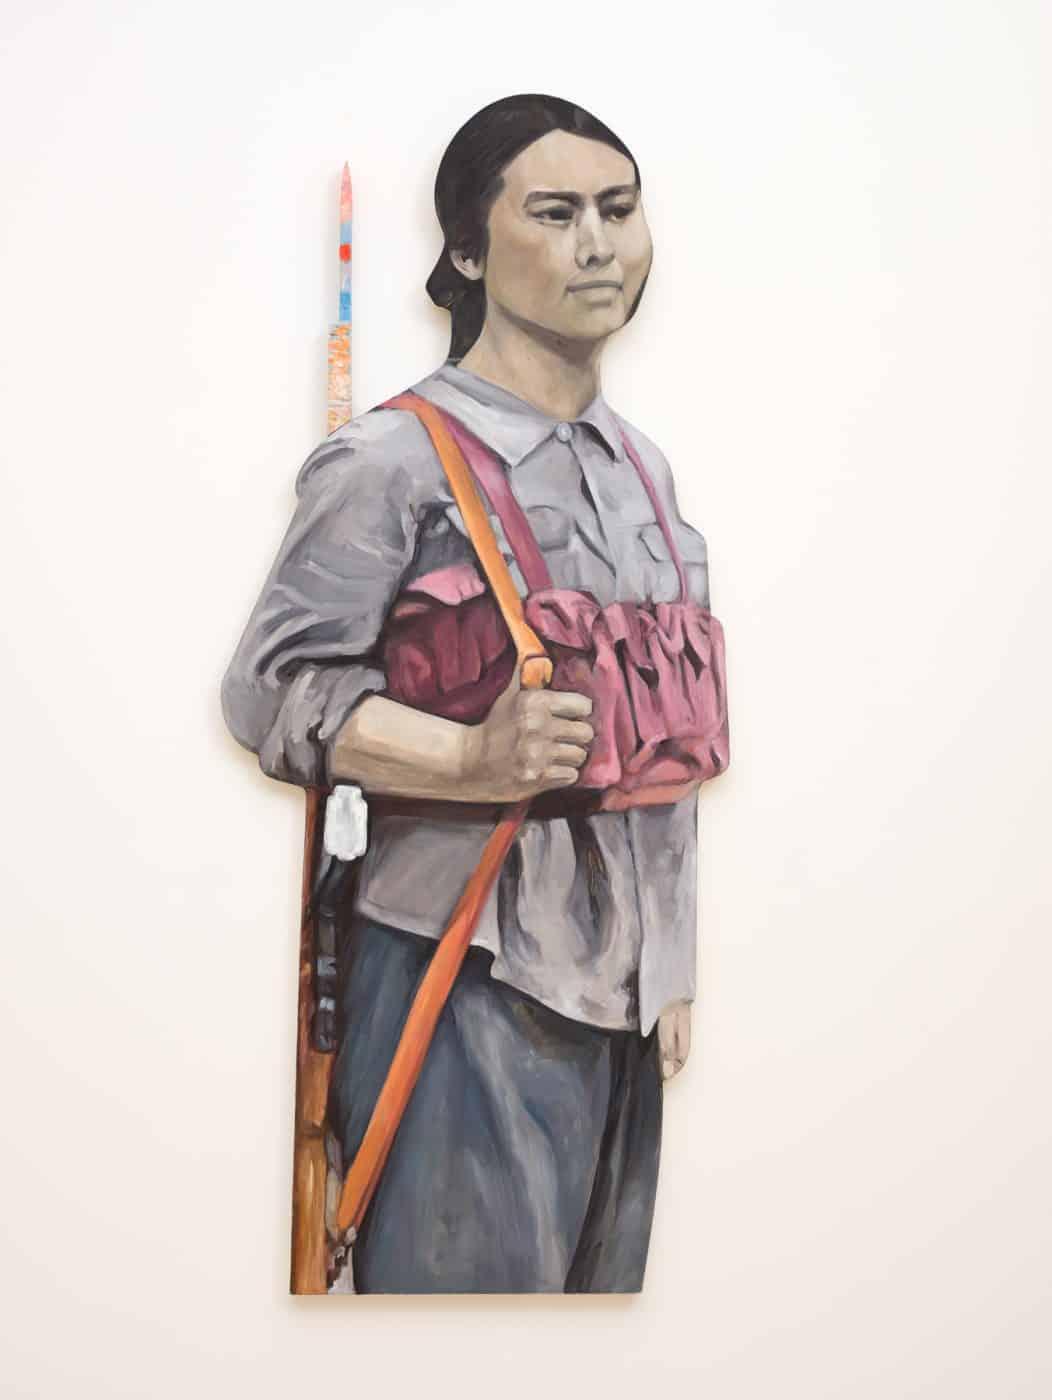 Avant-Garde, 1993, by Hung Liu